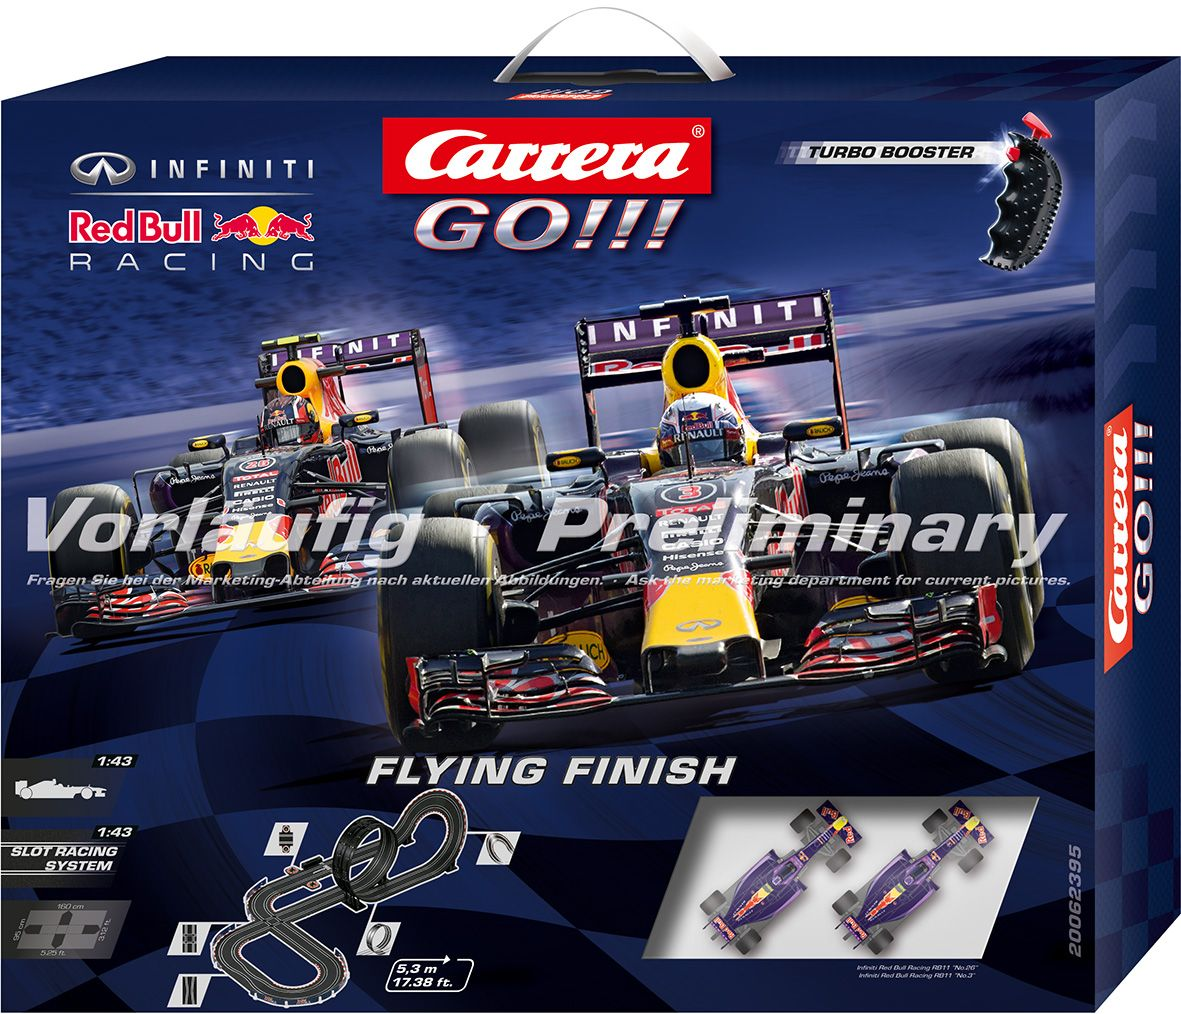 CARRERA Carrera Autorennbahn, »Carrera® GO!!! Flying Finish«